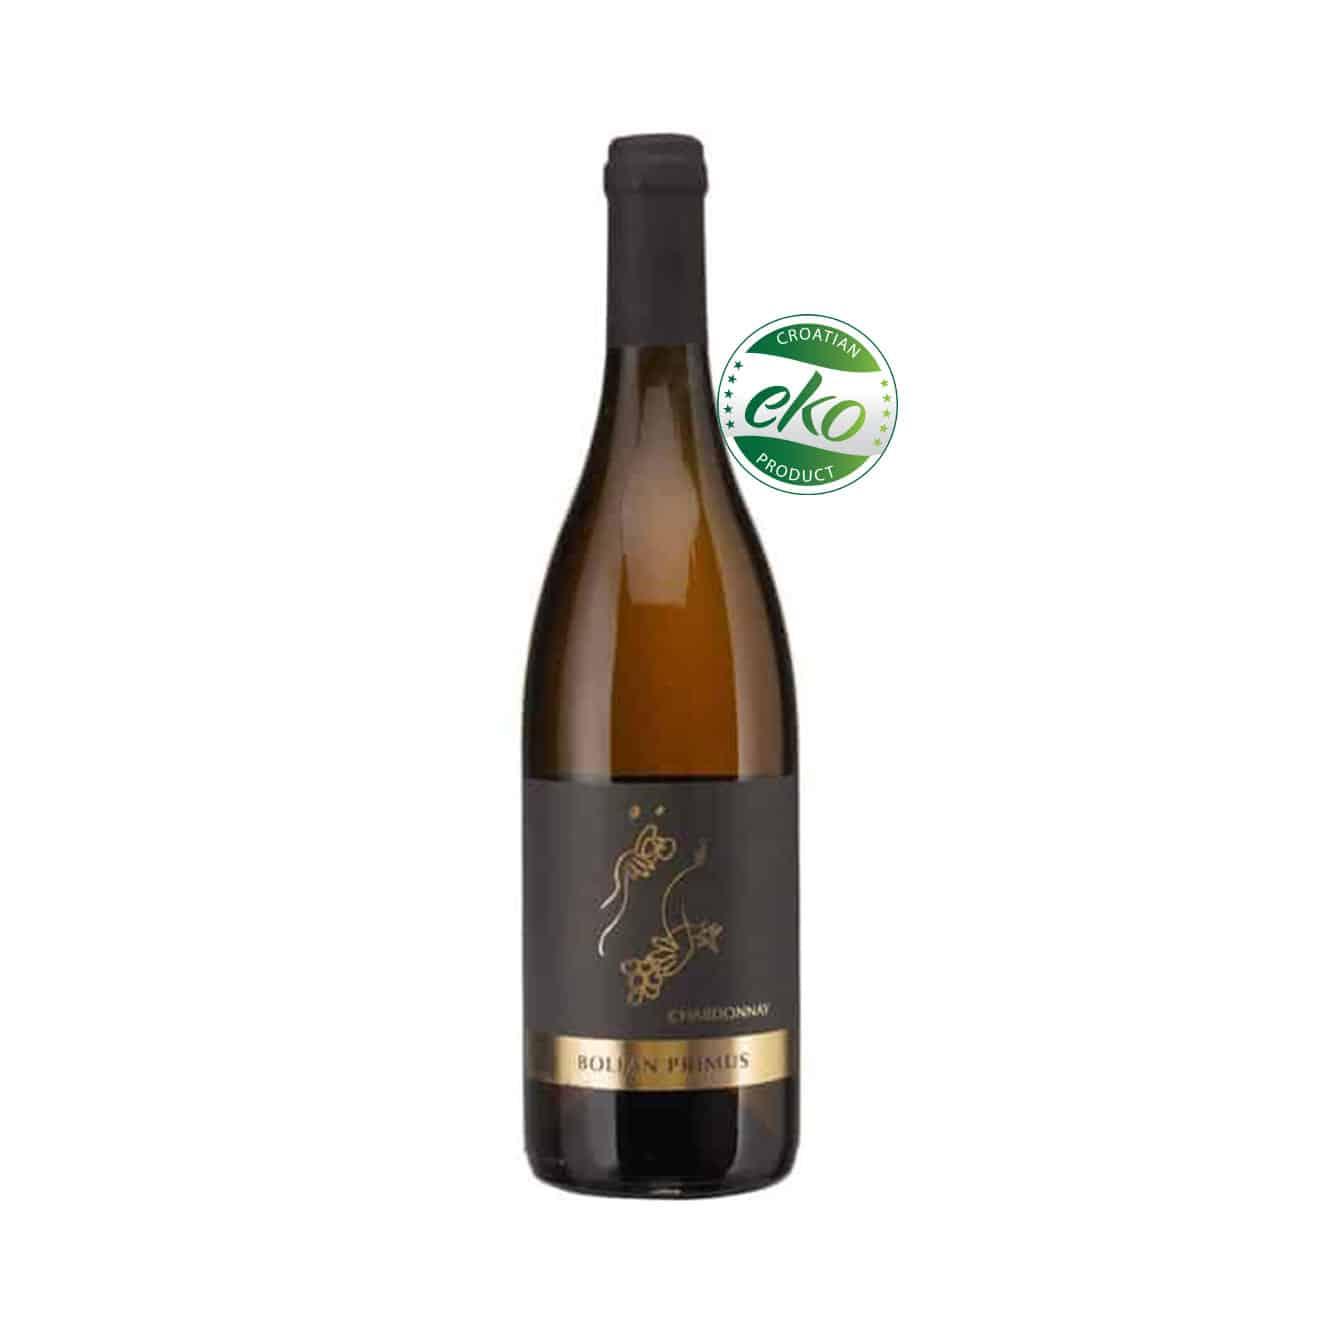 Bolfan Primus Chardonnay 2012